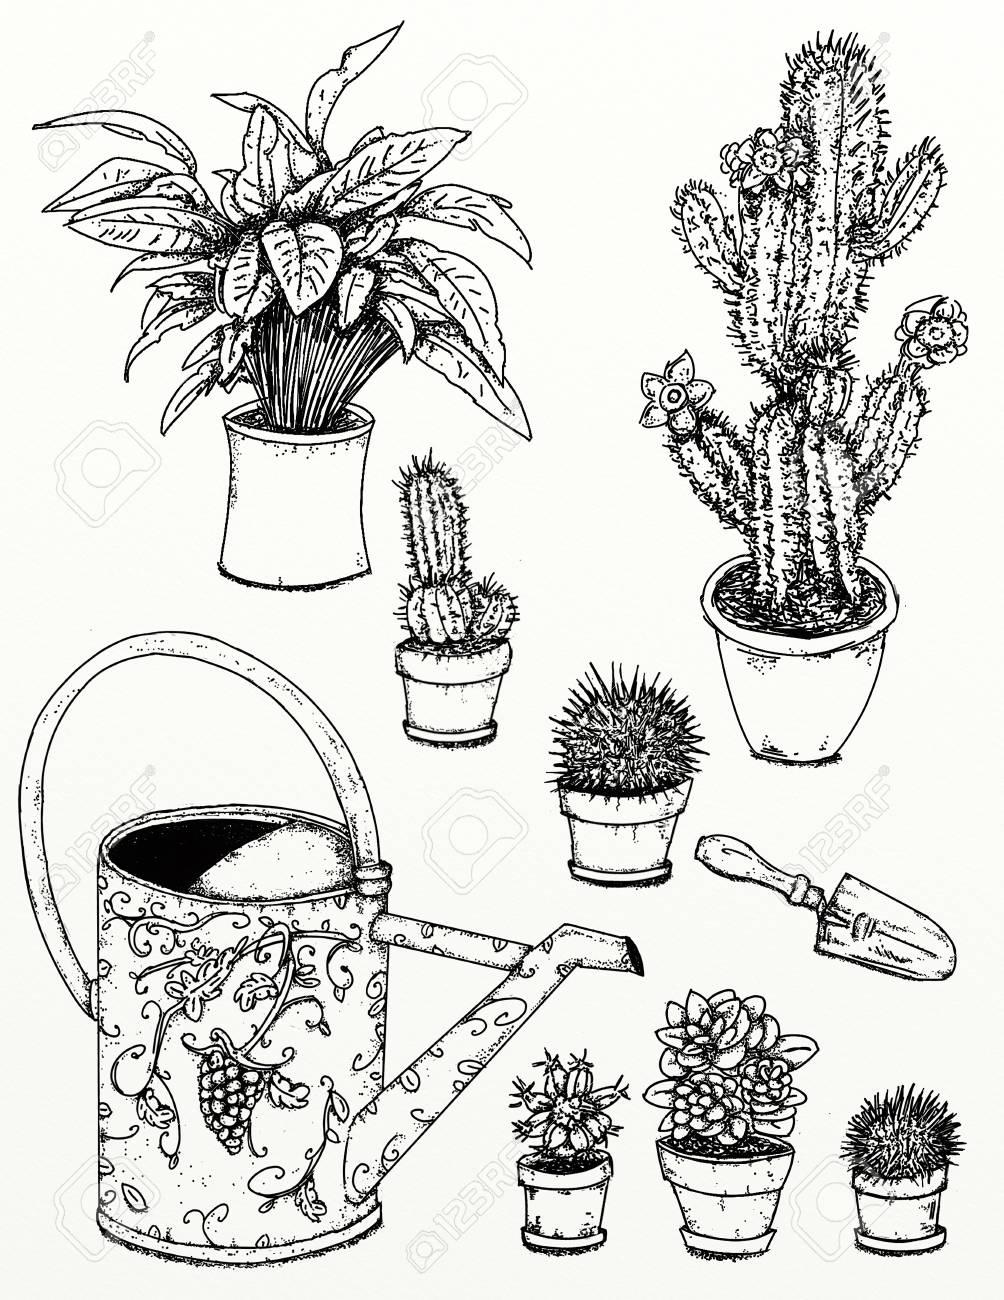 1004x1300 Realistic Designs To Garden And Garden Plants Garden Flowers